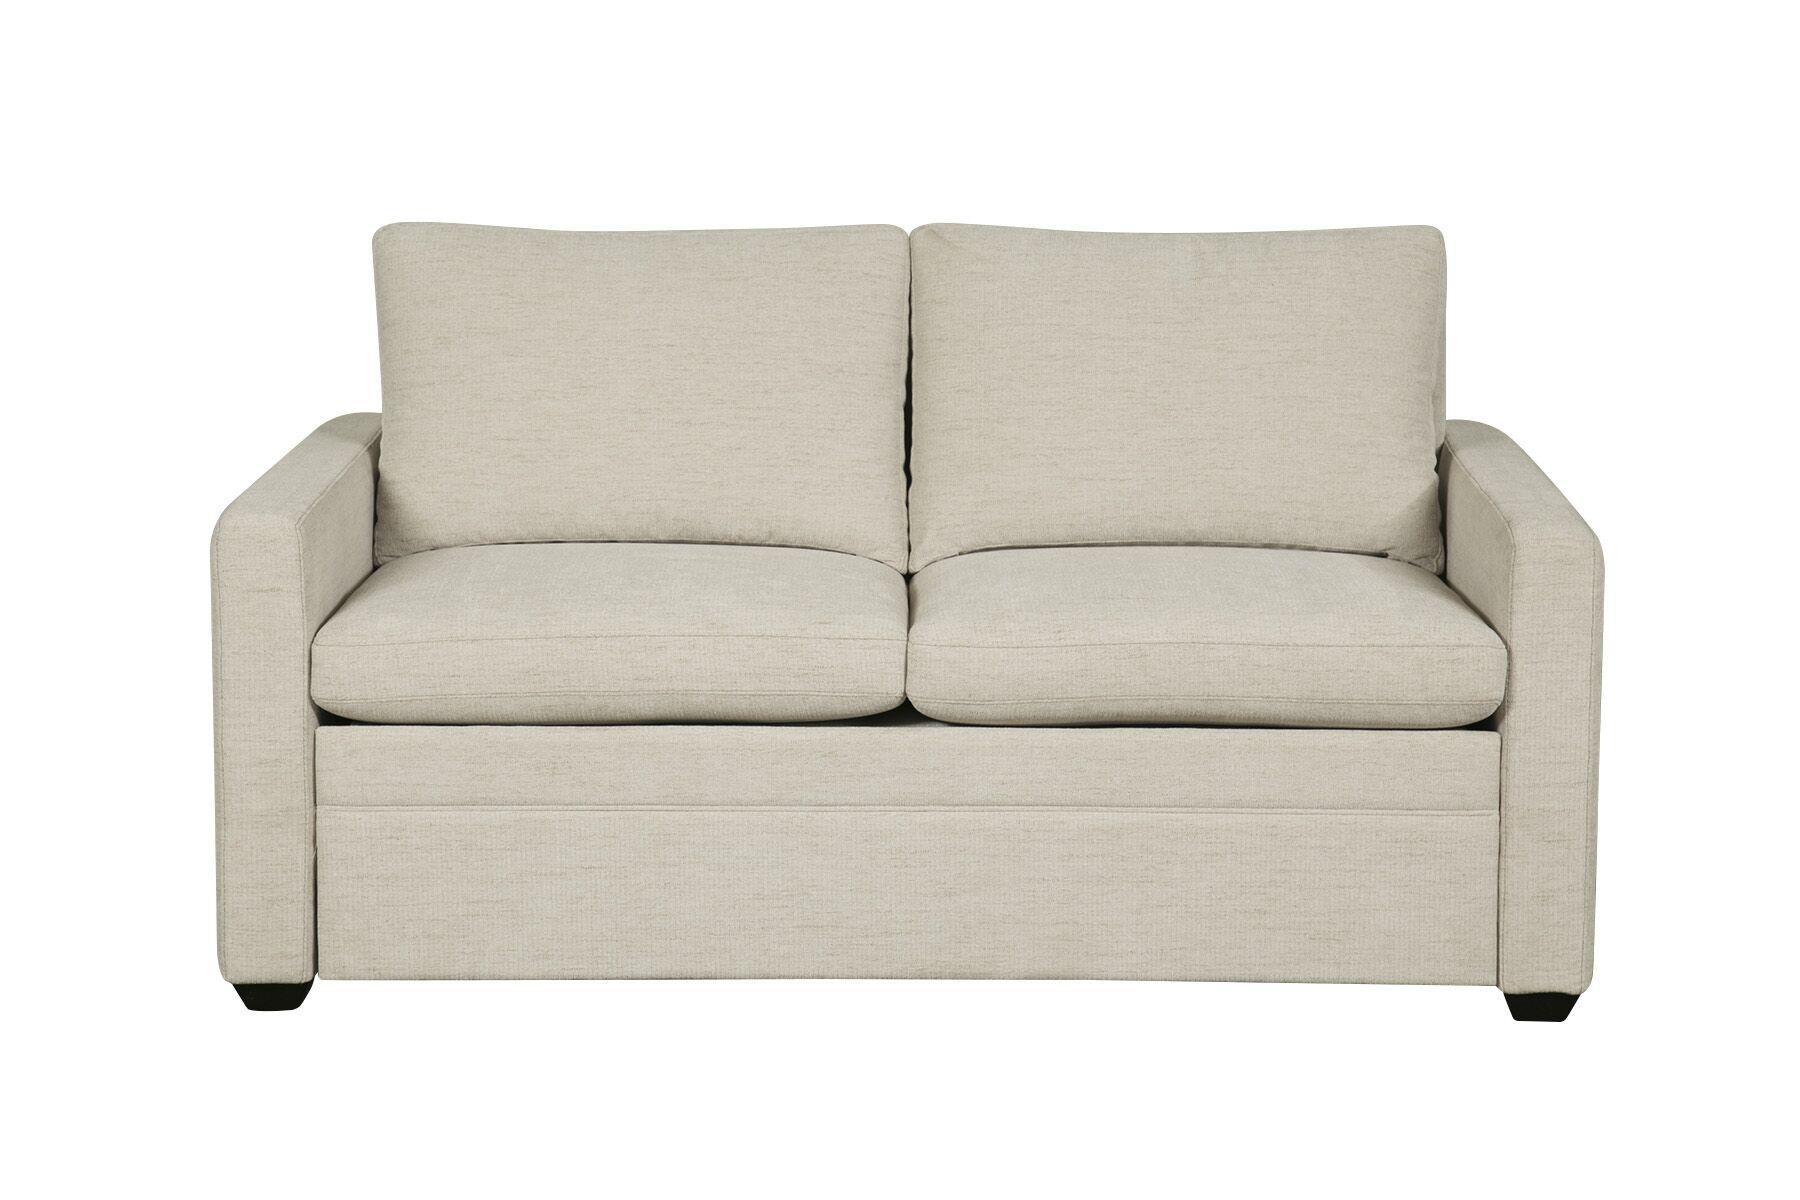 Regent Sleeper Sofa Upholstery: Charcoal, Mattress Type: Twin Chair